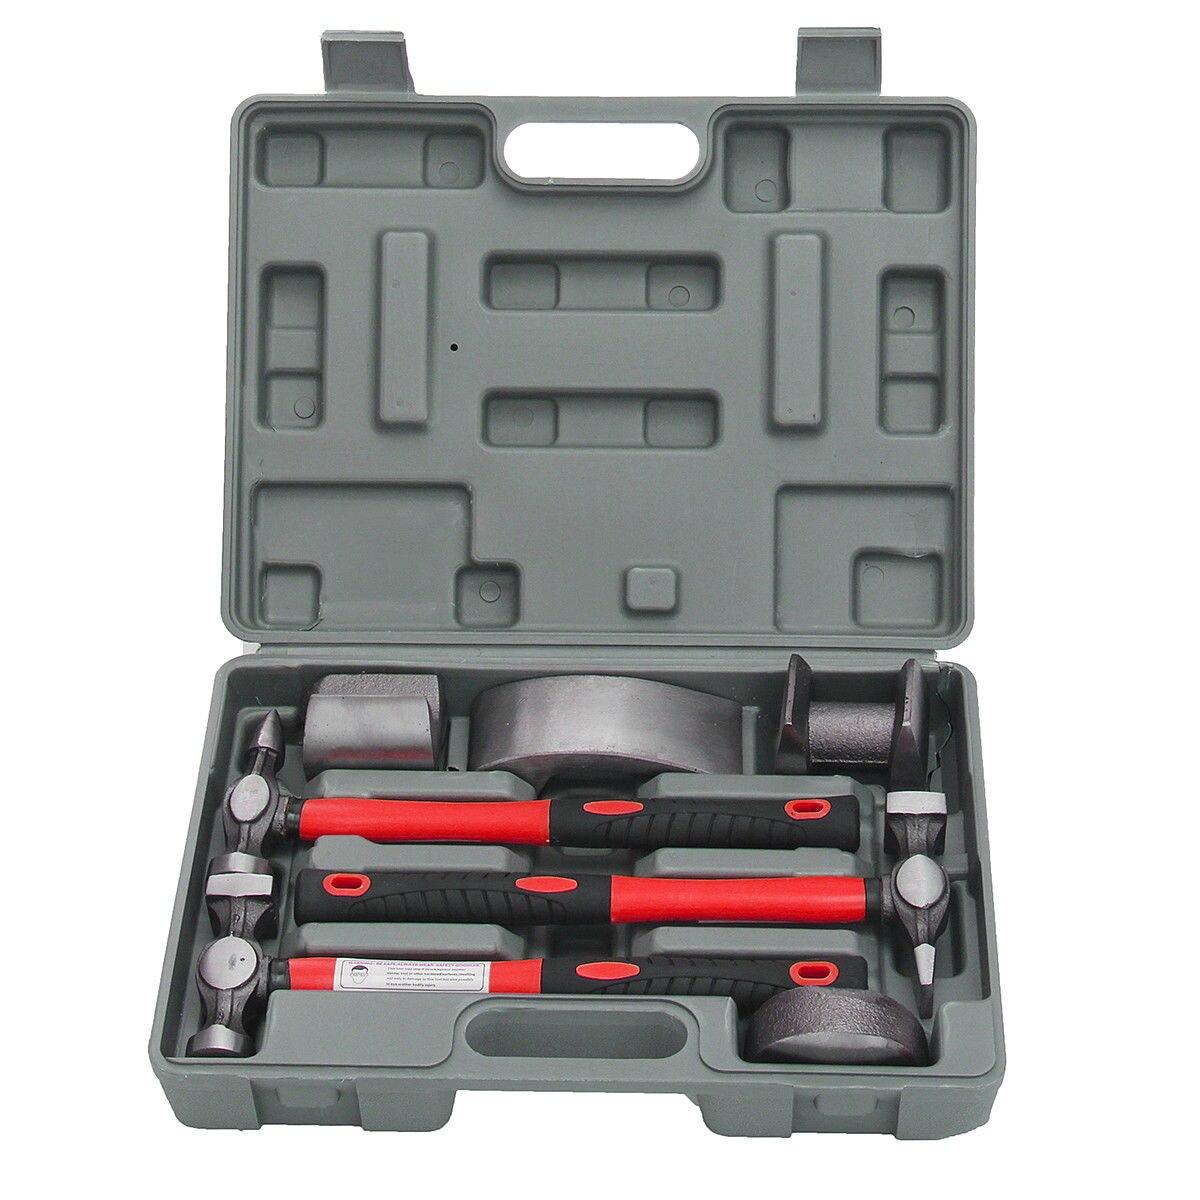 Kit Fender Fiberglass Auto Hammer Body Tools 7Pcs Bender Tool Dolly Repair Dent